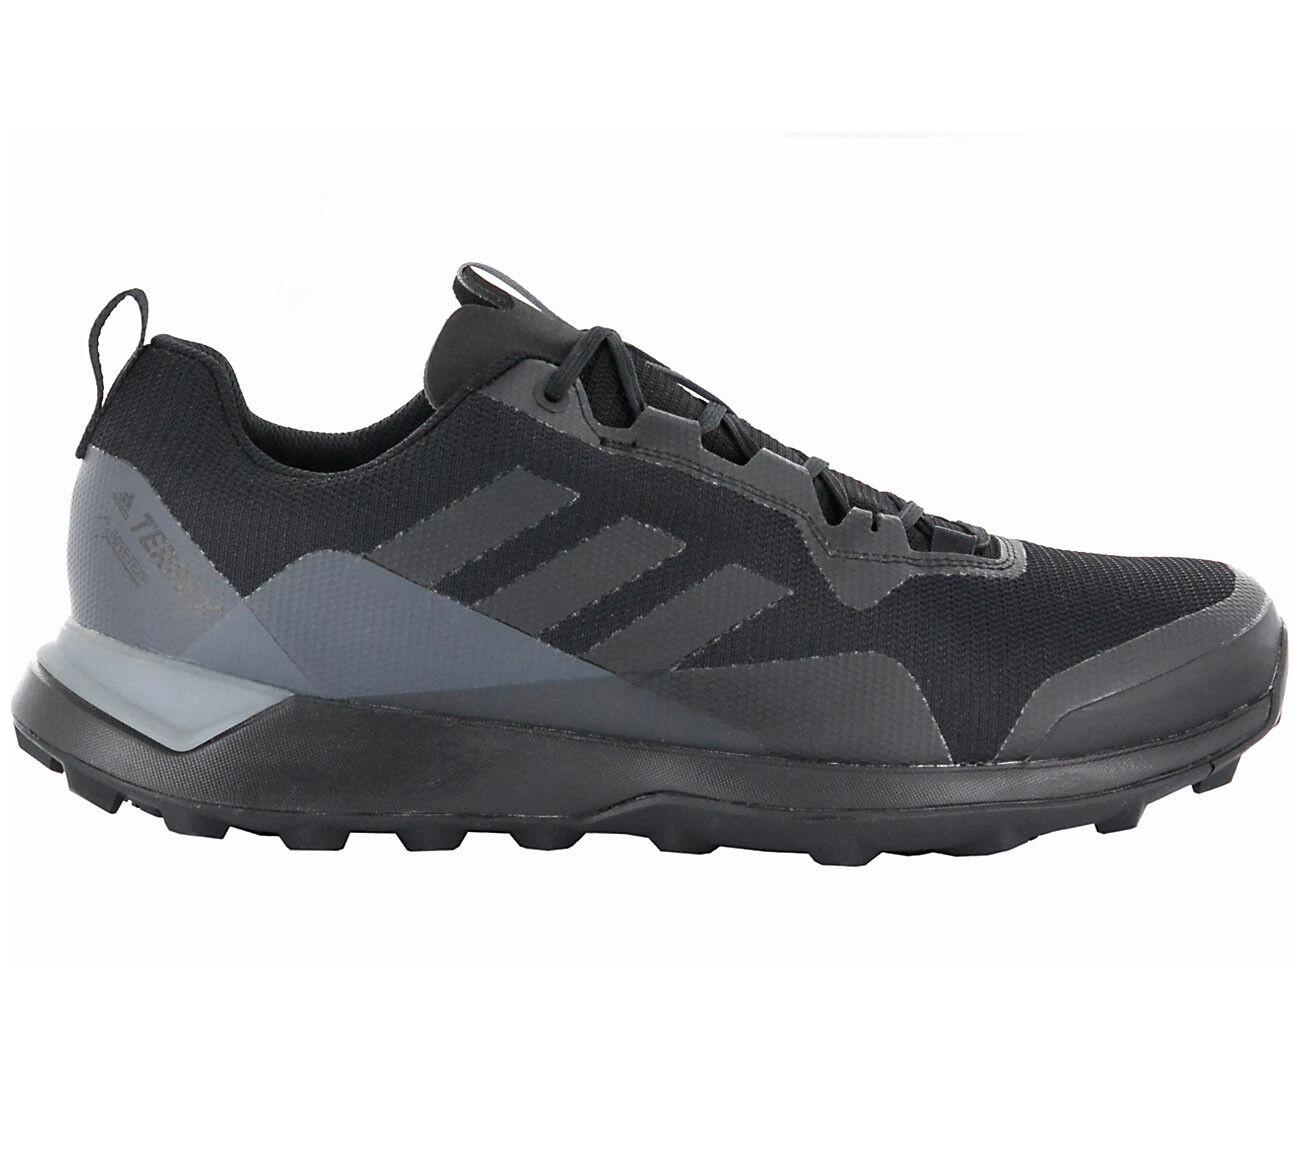 adidas Terrex CMTK GTX Gore-Tex Schuhe Schwarz Herren Wanderschuhe Trail BY2770